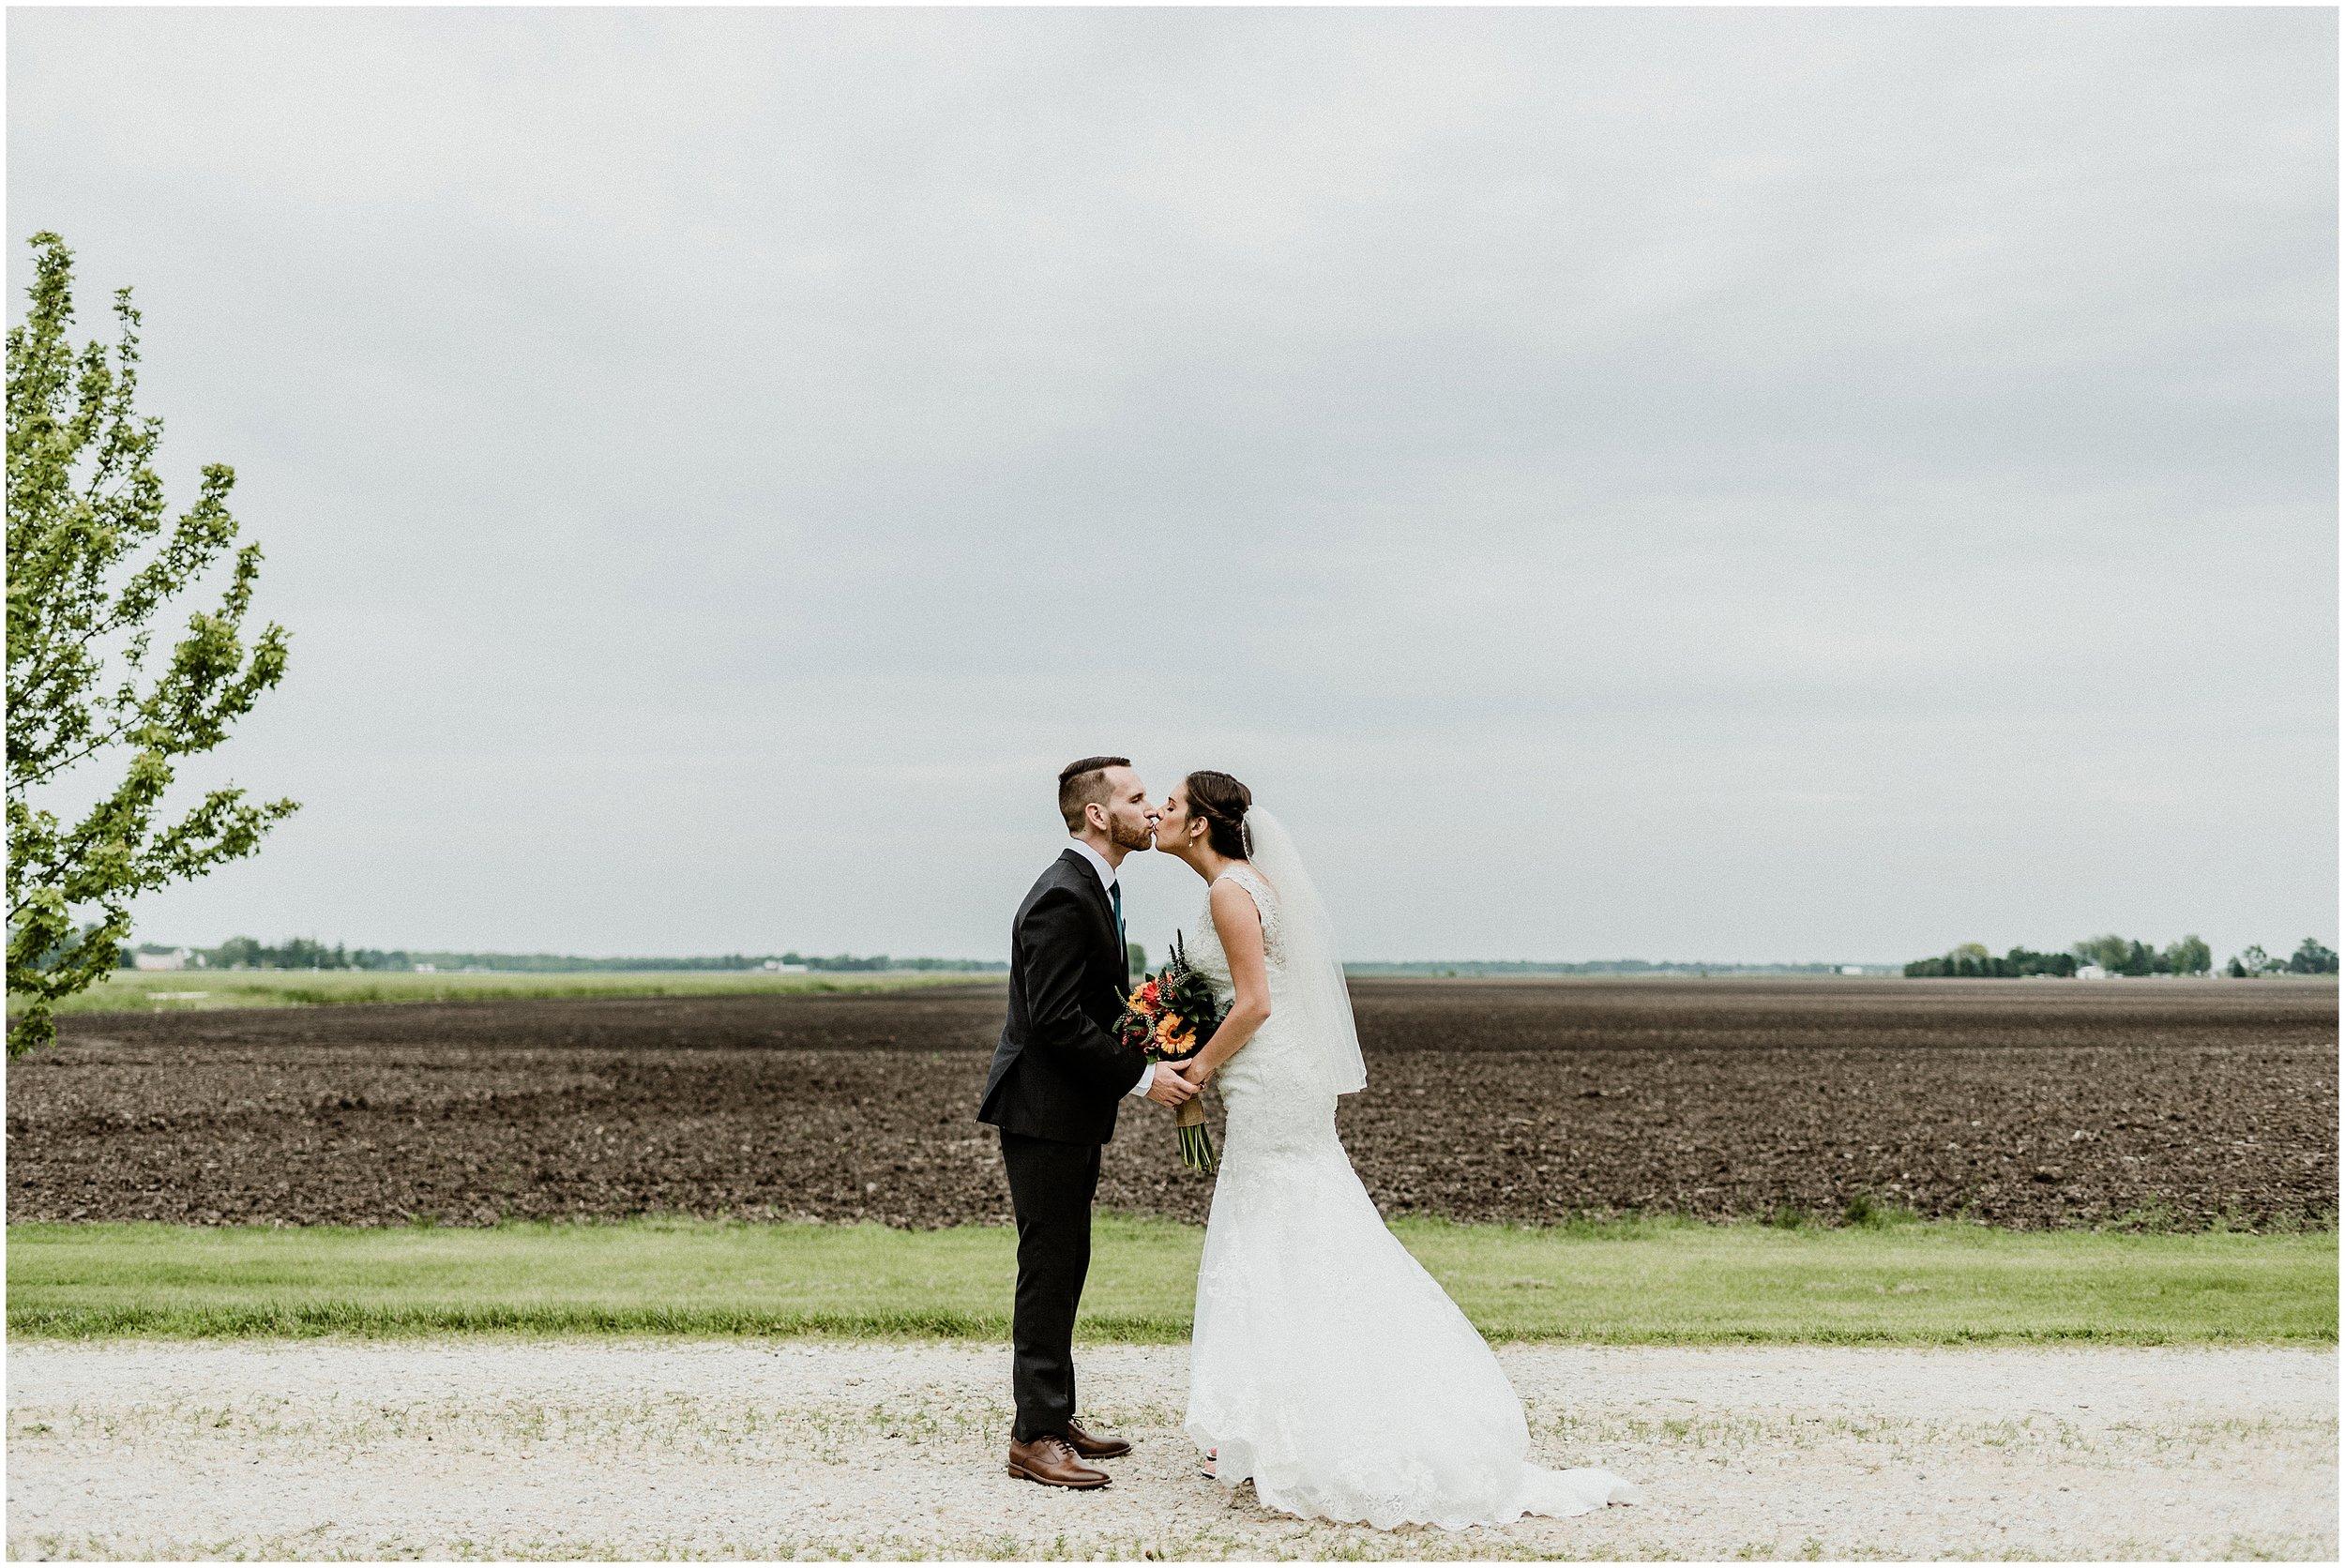 Rustic Romantic Barn Wedding | The Mora Farm Waterman, IL | Chicago Wedding Photographer